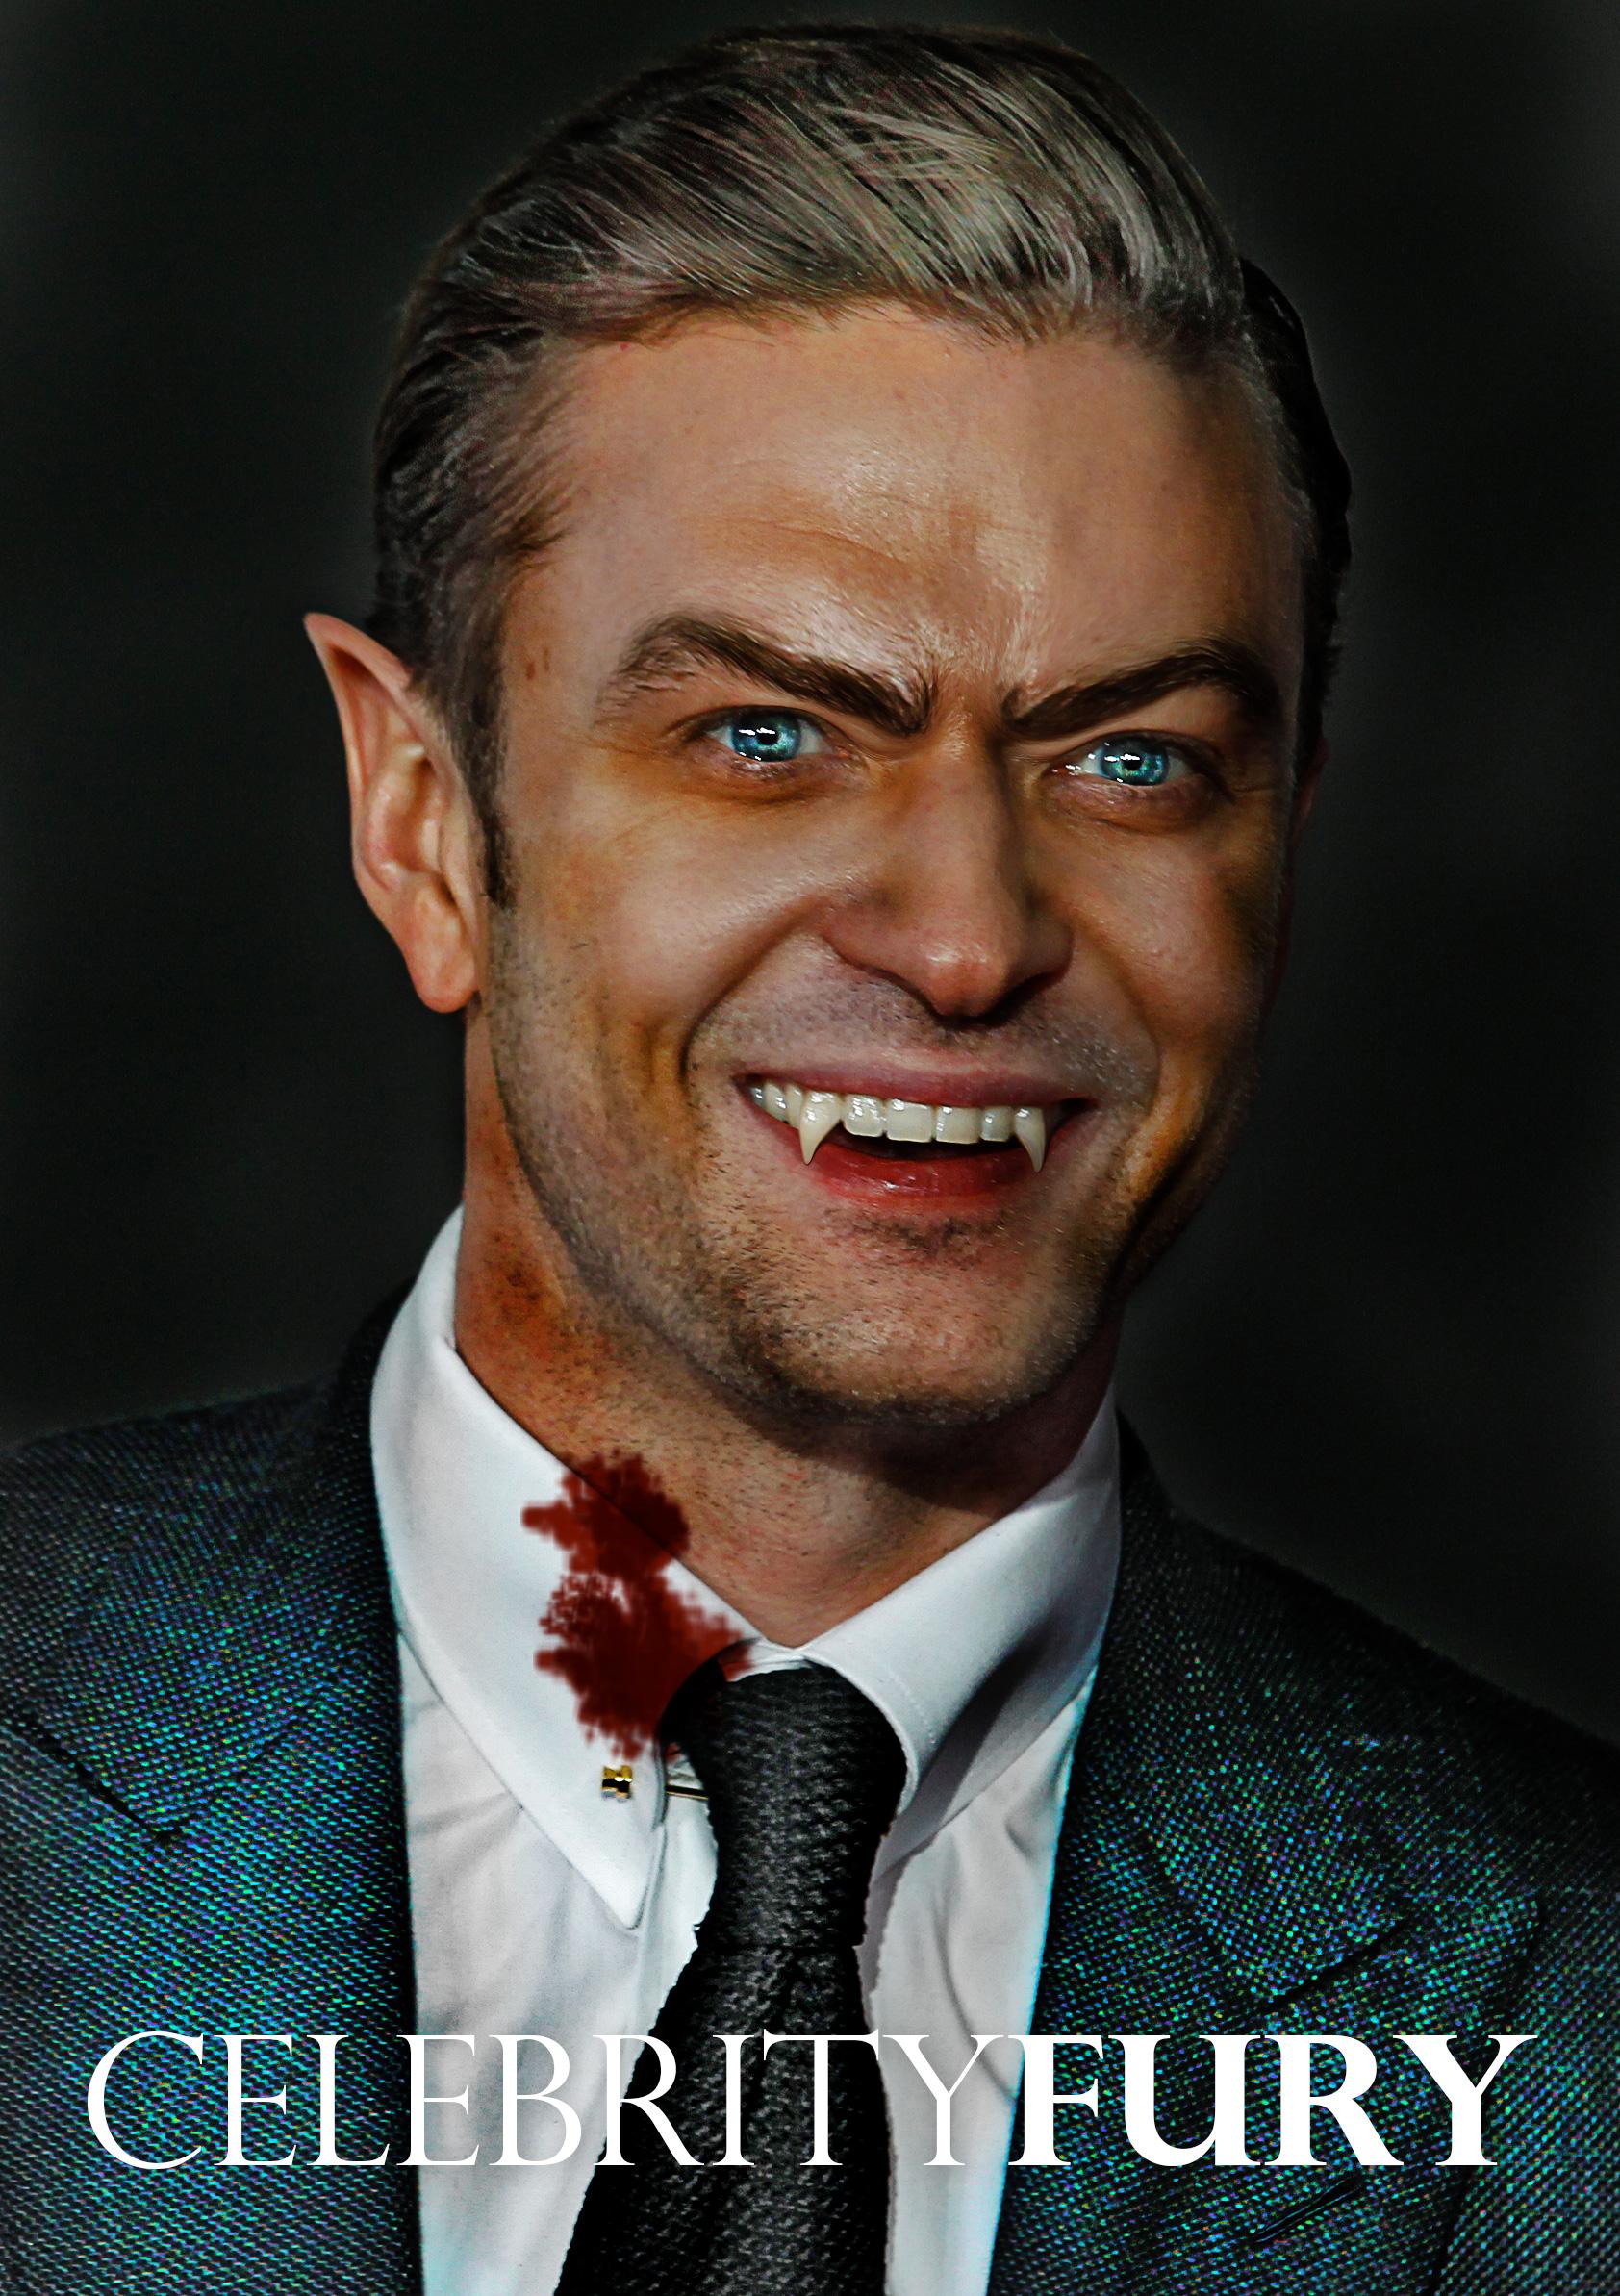 justin-timberlake Justin Timberlake Justin Timberlake justin timberlake